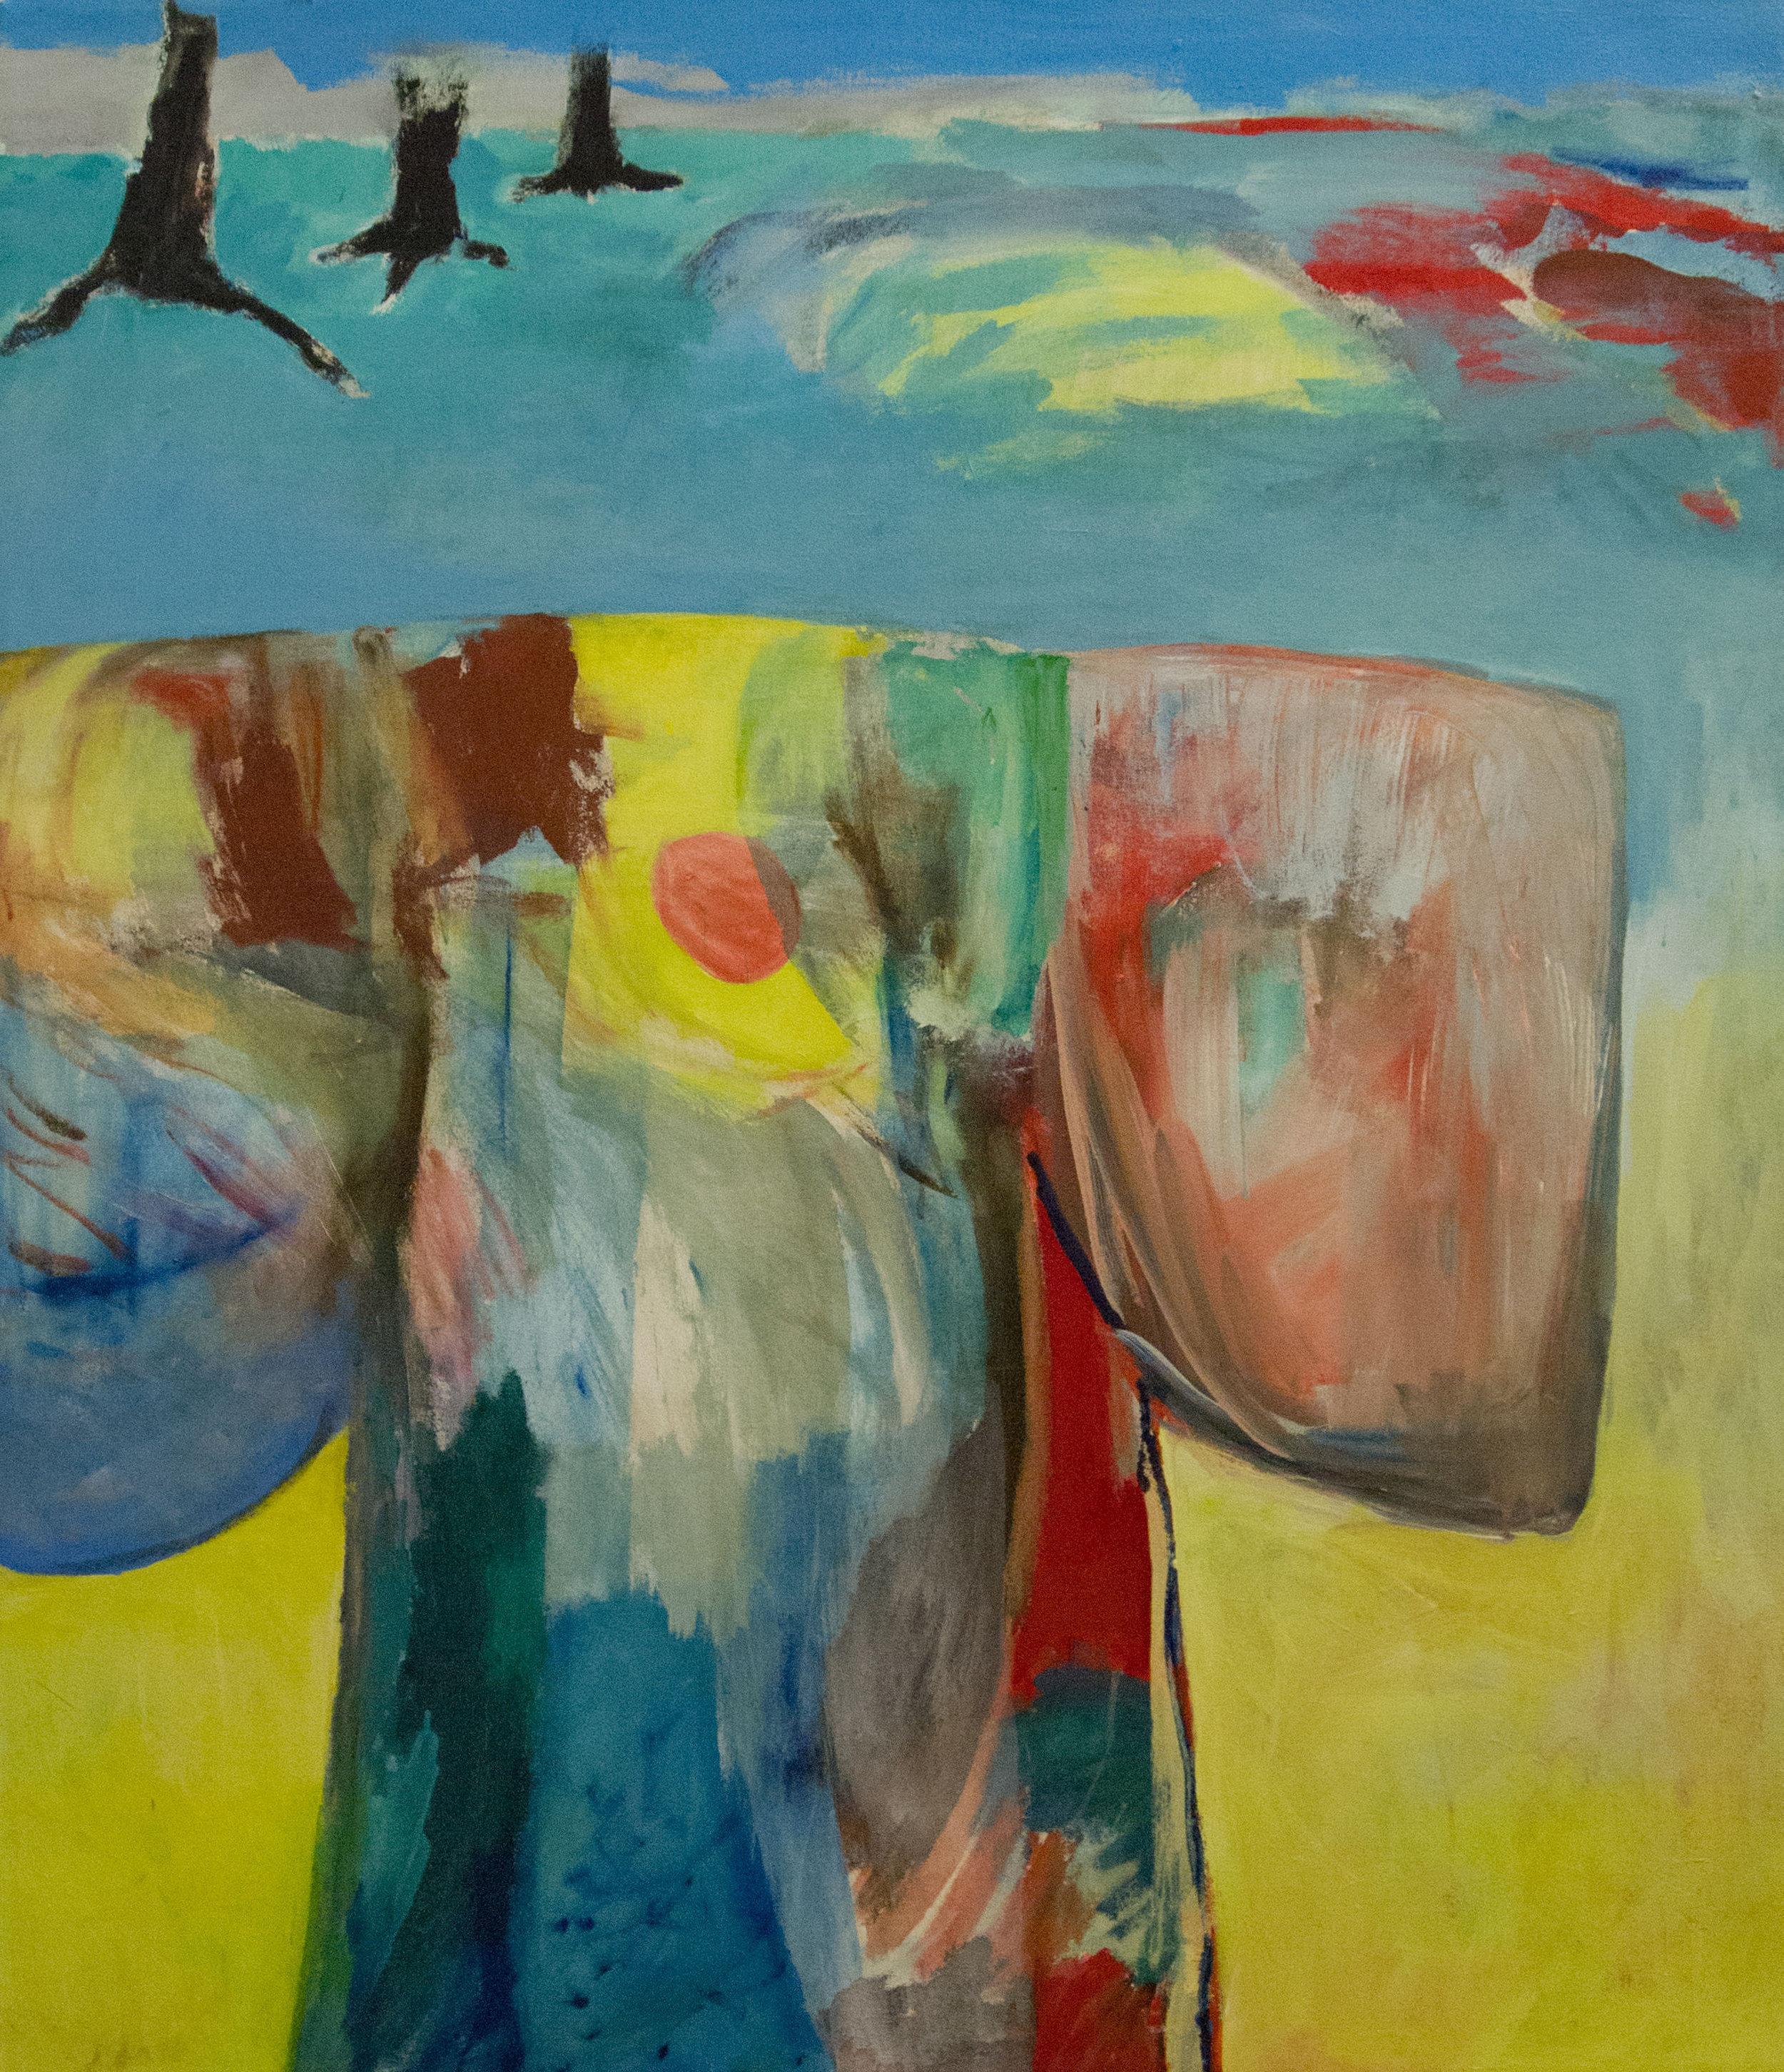 Landscape Kimono, 2002. Acrylic on canvas, 55 x 48 in. ( 140 x 122 cm. )